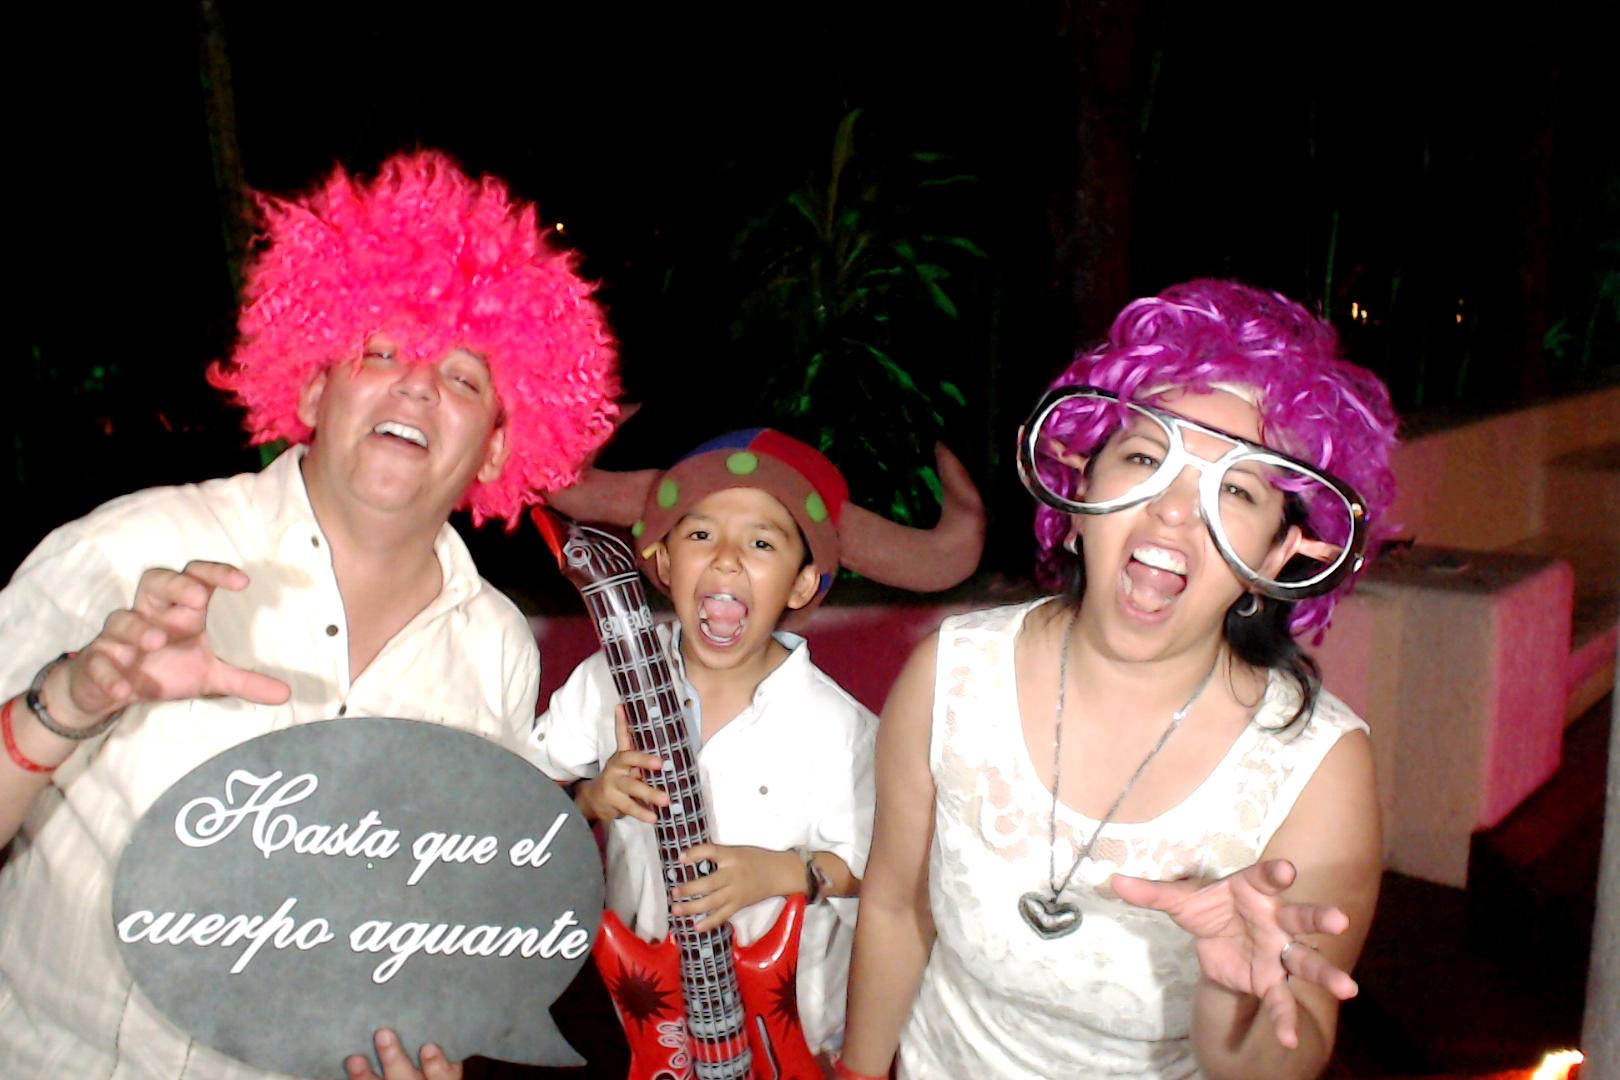 PlayadelCarmenPhotoBoothMexico0032.JPG